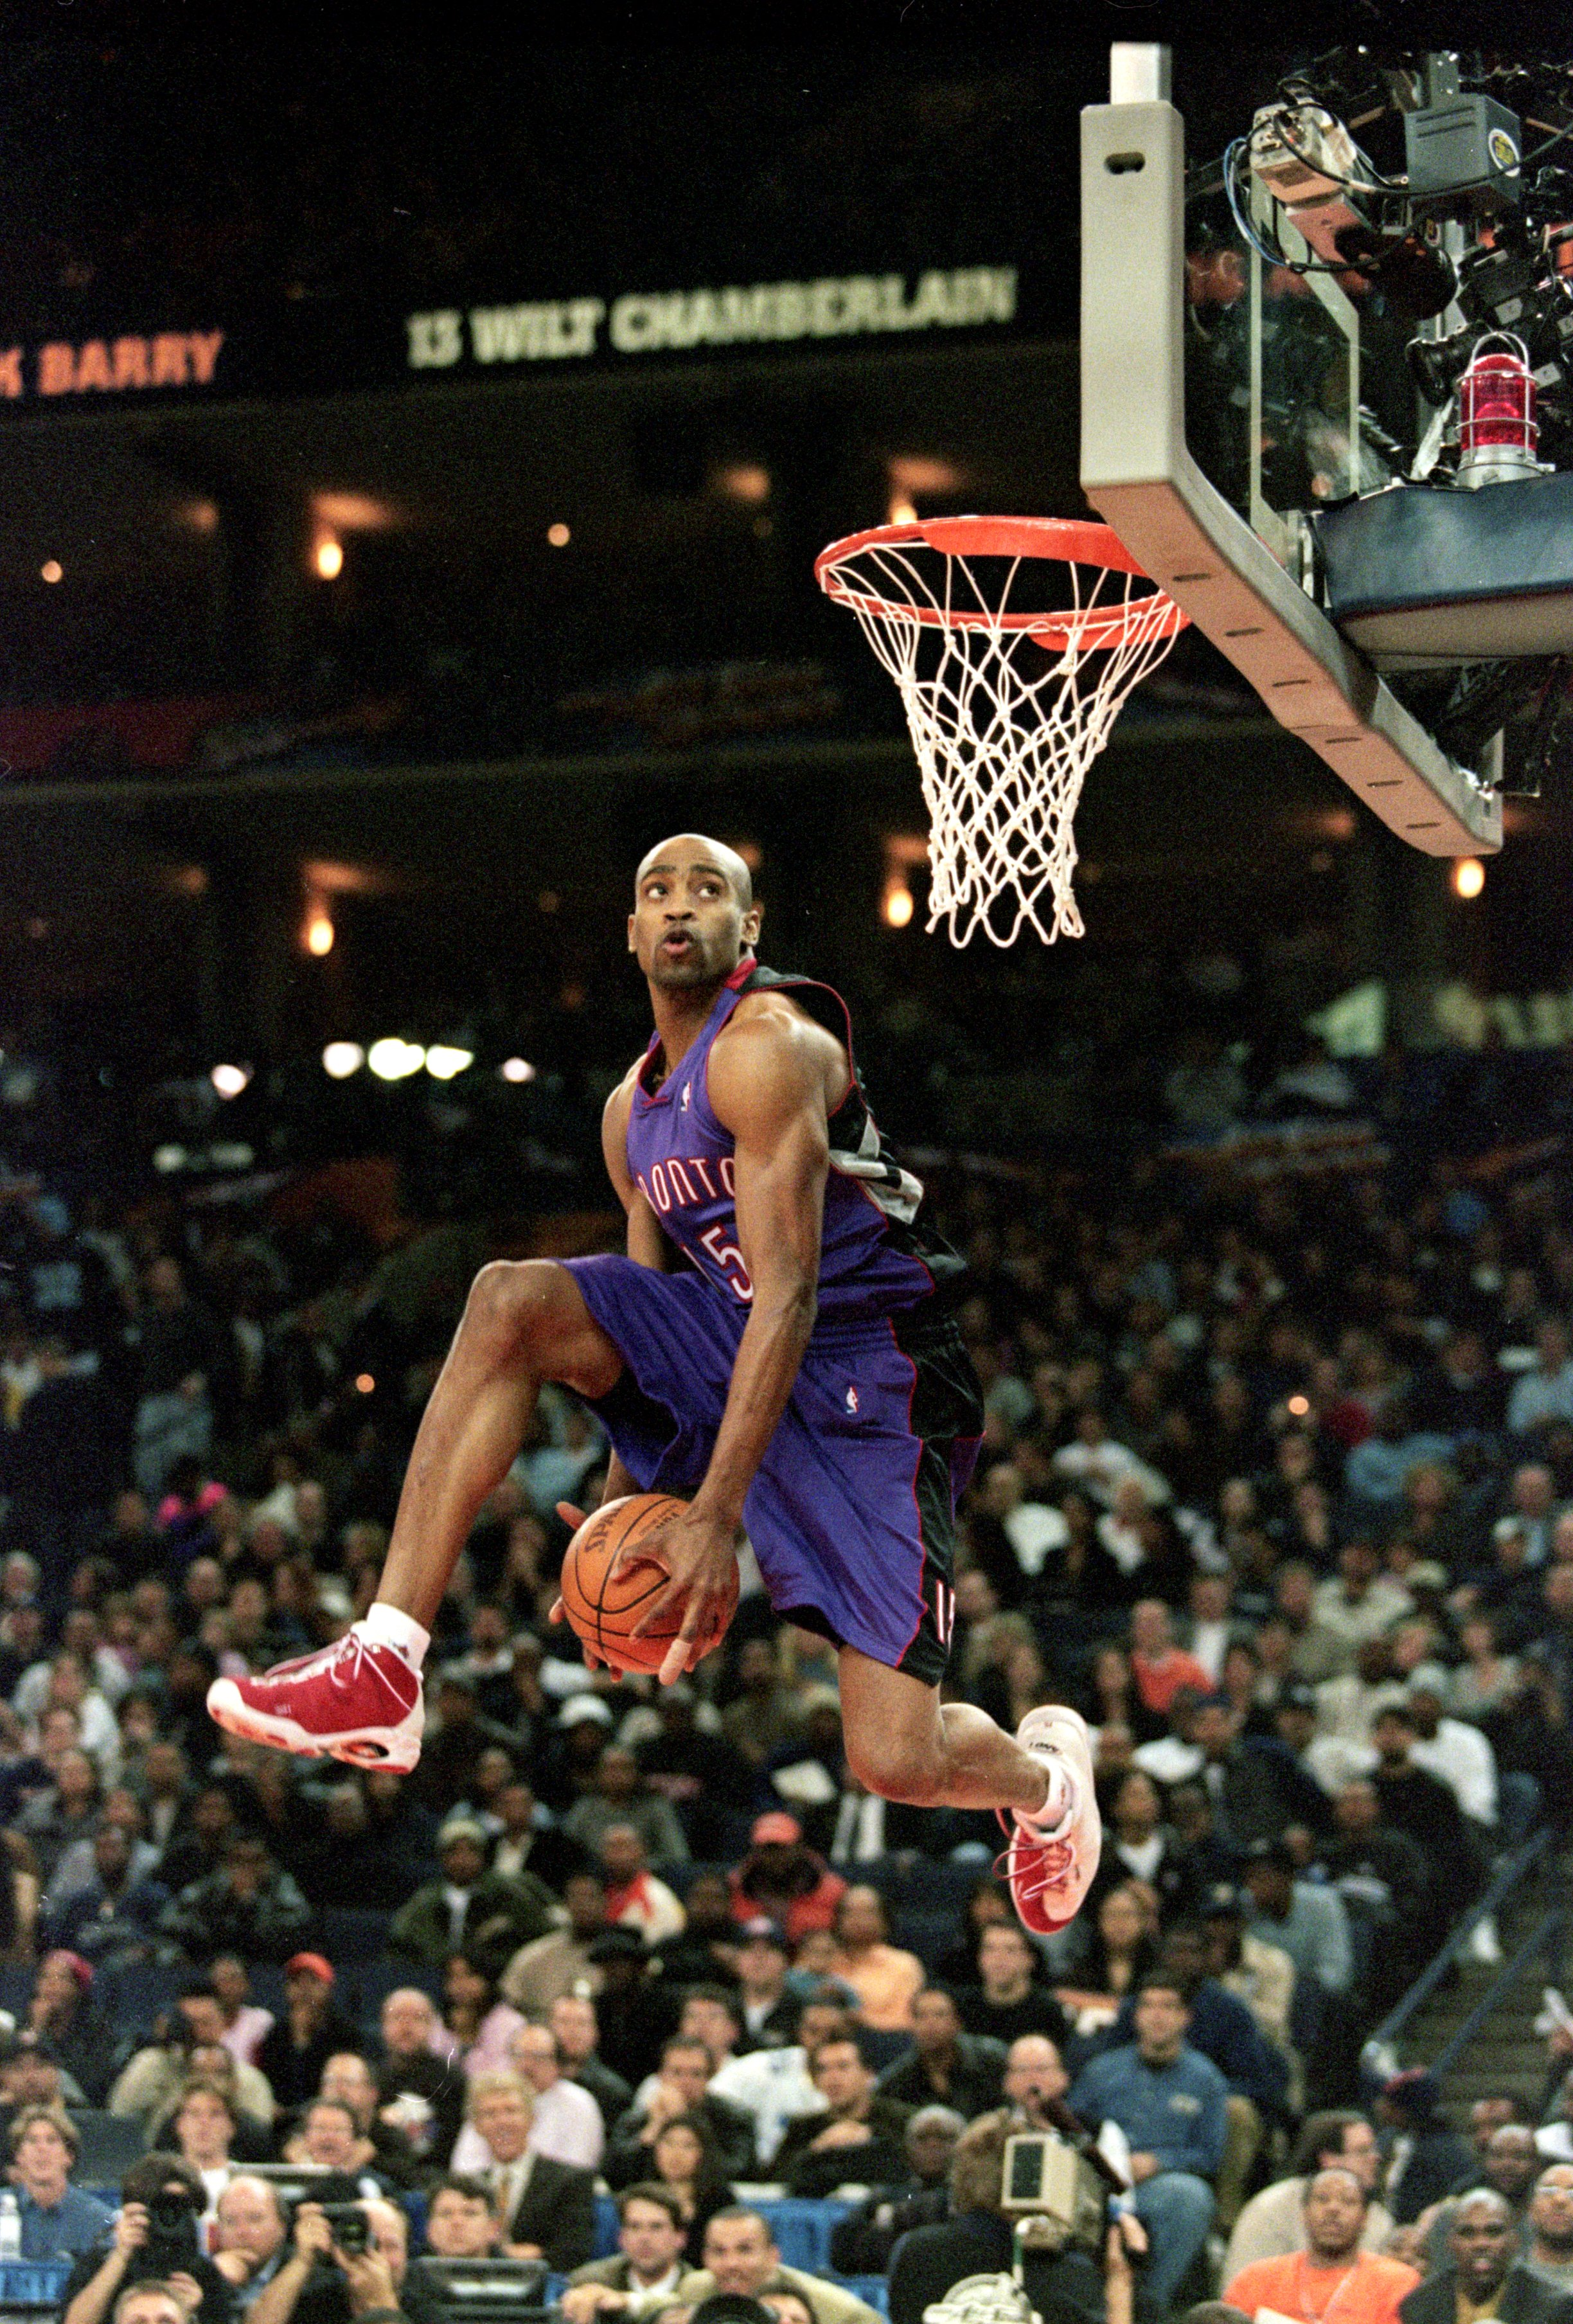 13 Feb 2000: Vince Carter #15 of the Toronto Raptors jumps during the NBA Allstar Game Slam Dunk Contest at the Oakland Coliseum in Oakland, California.    Mandatory Credit: Jed Jacobsohn  /Allsport